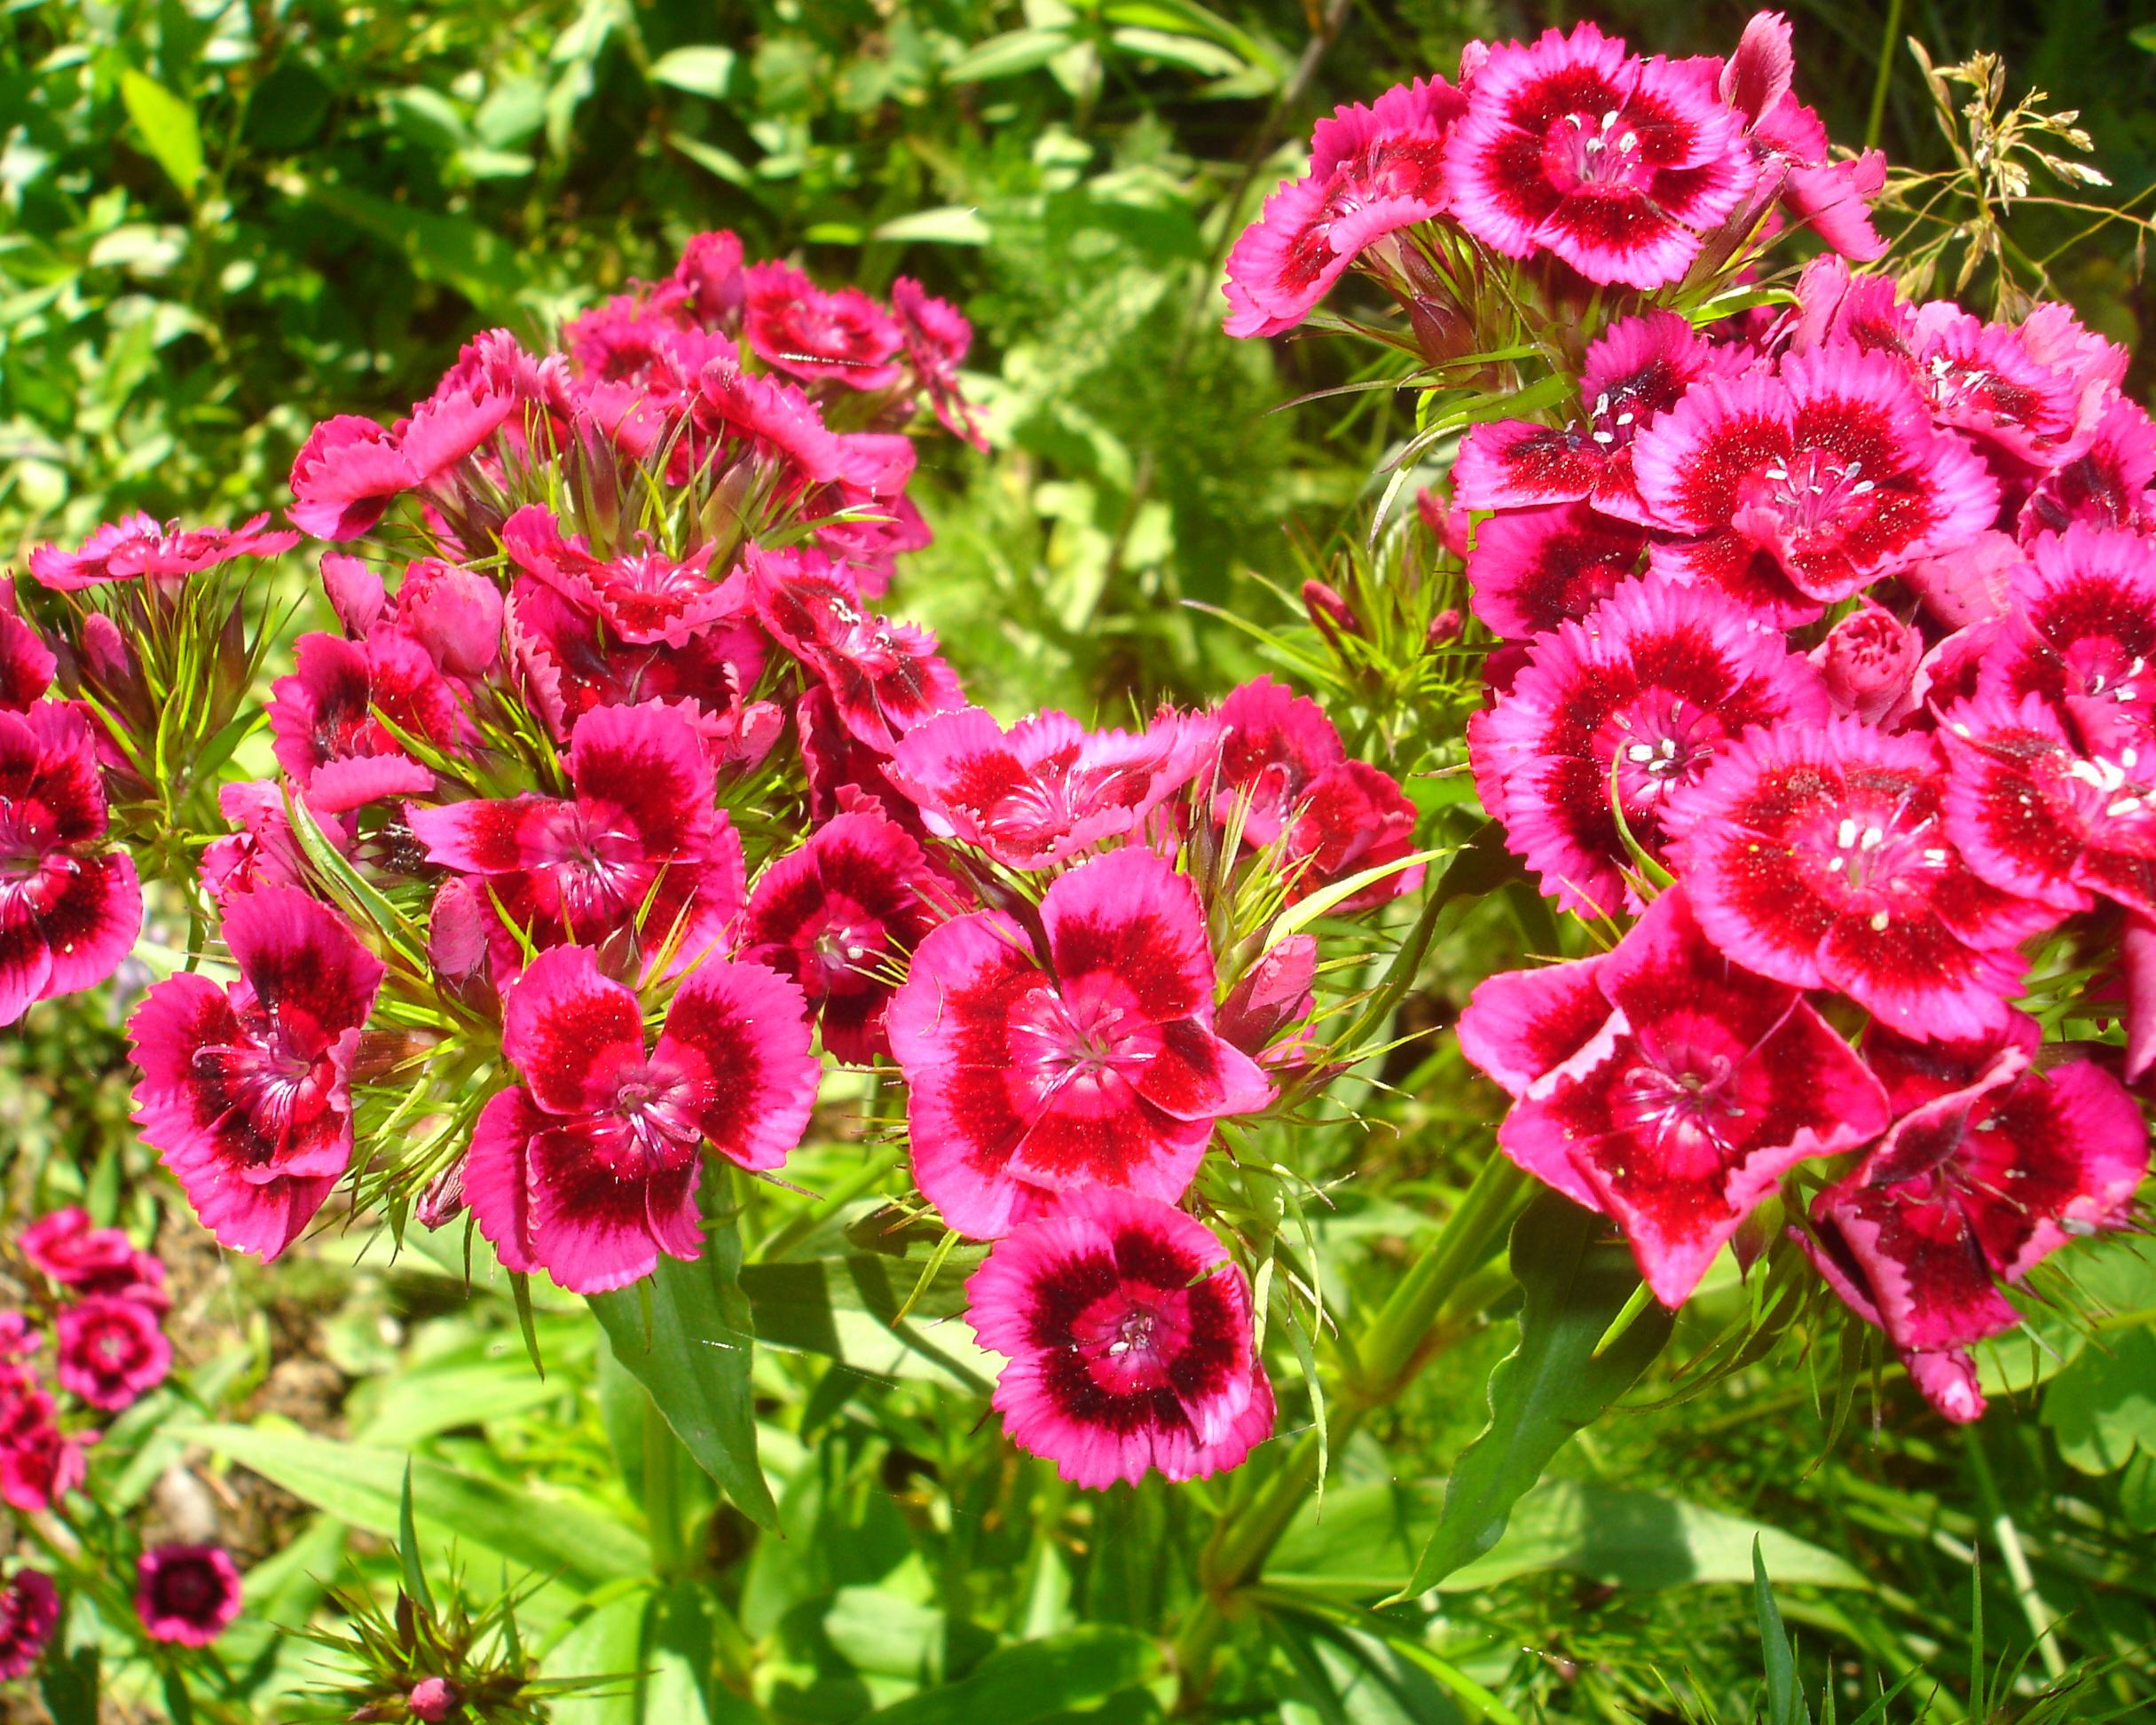 https://0901.nccdn.net/4_2/000/000/011/751/flowers03.jpg